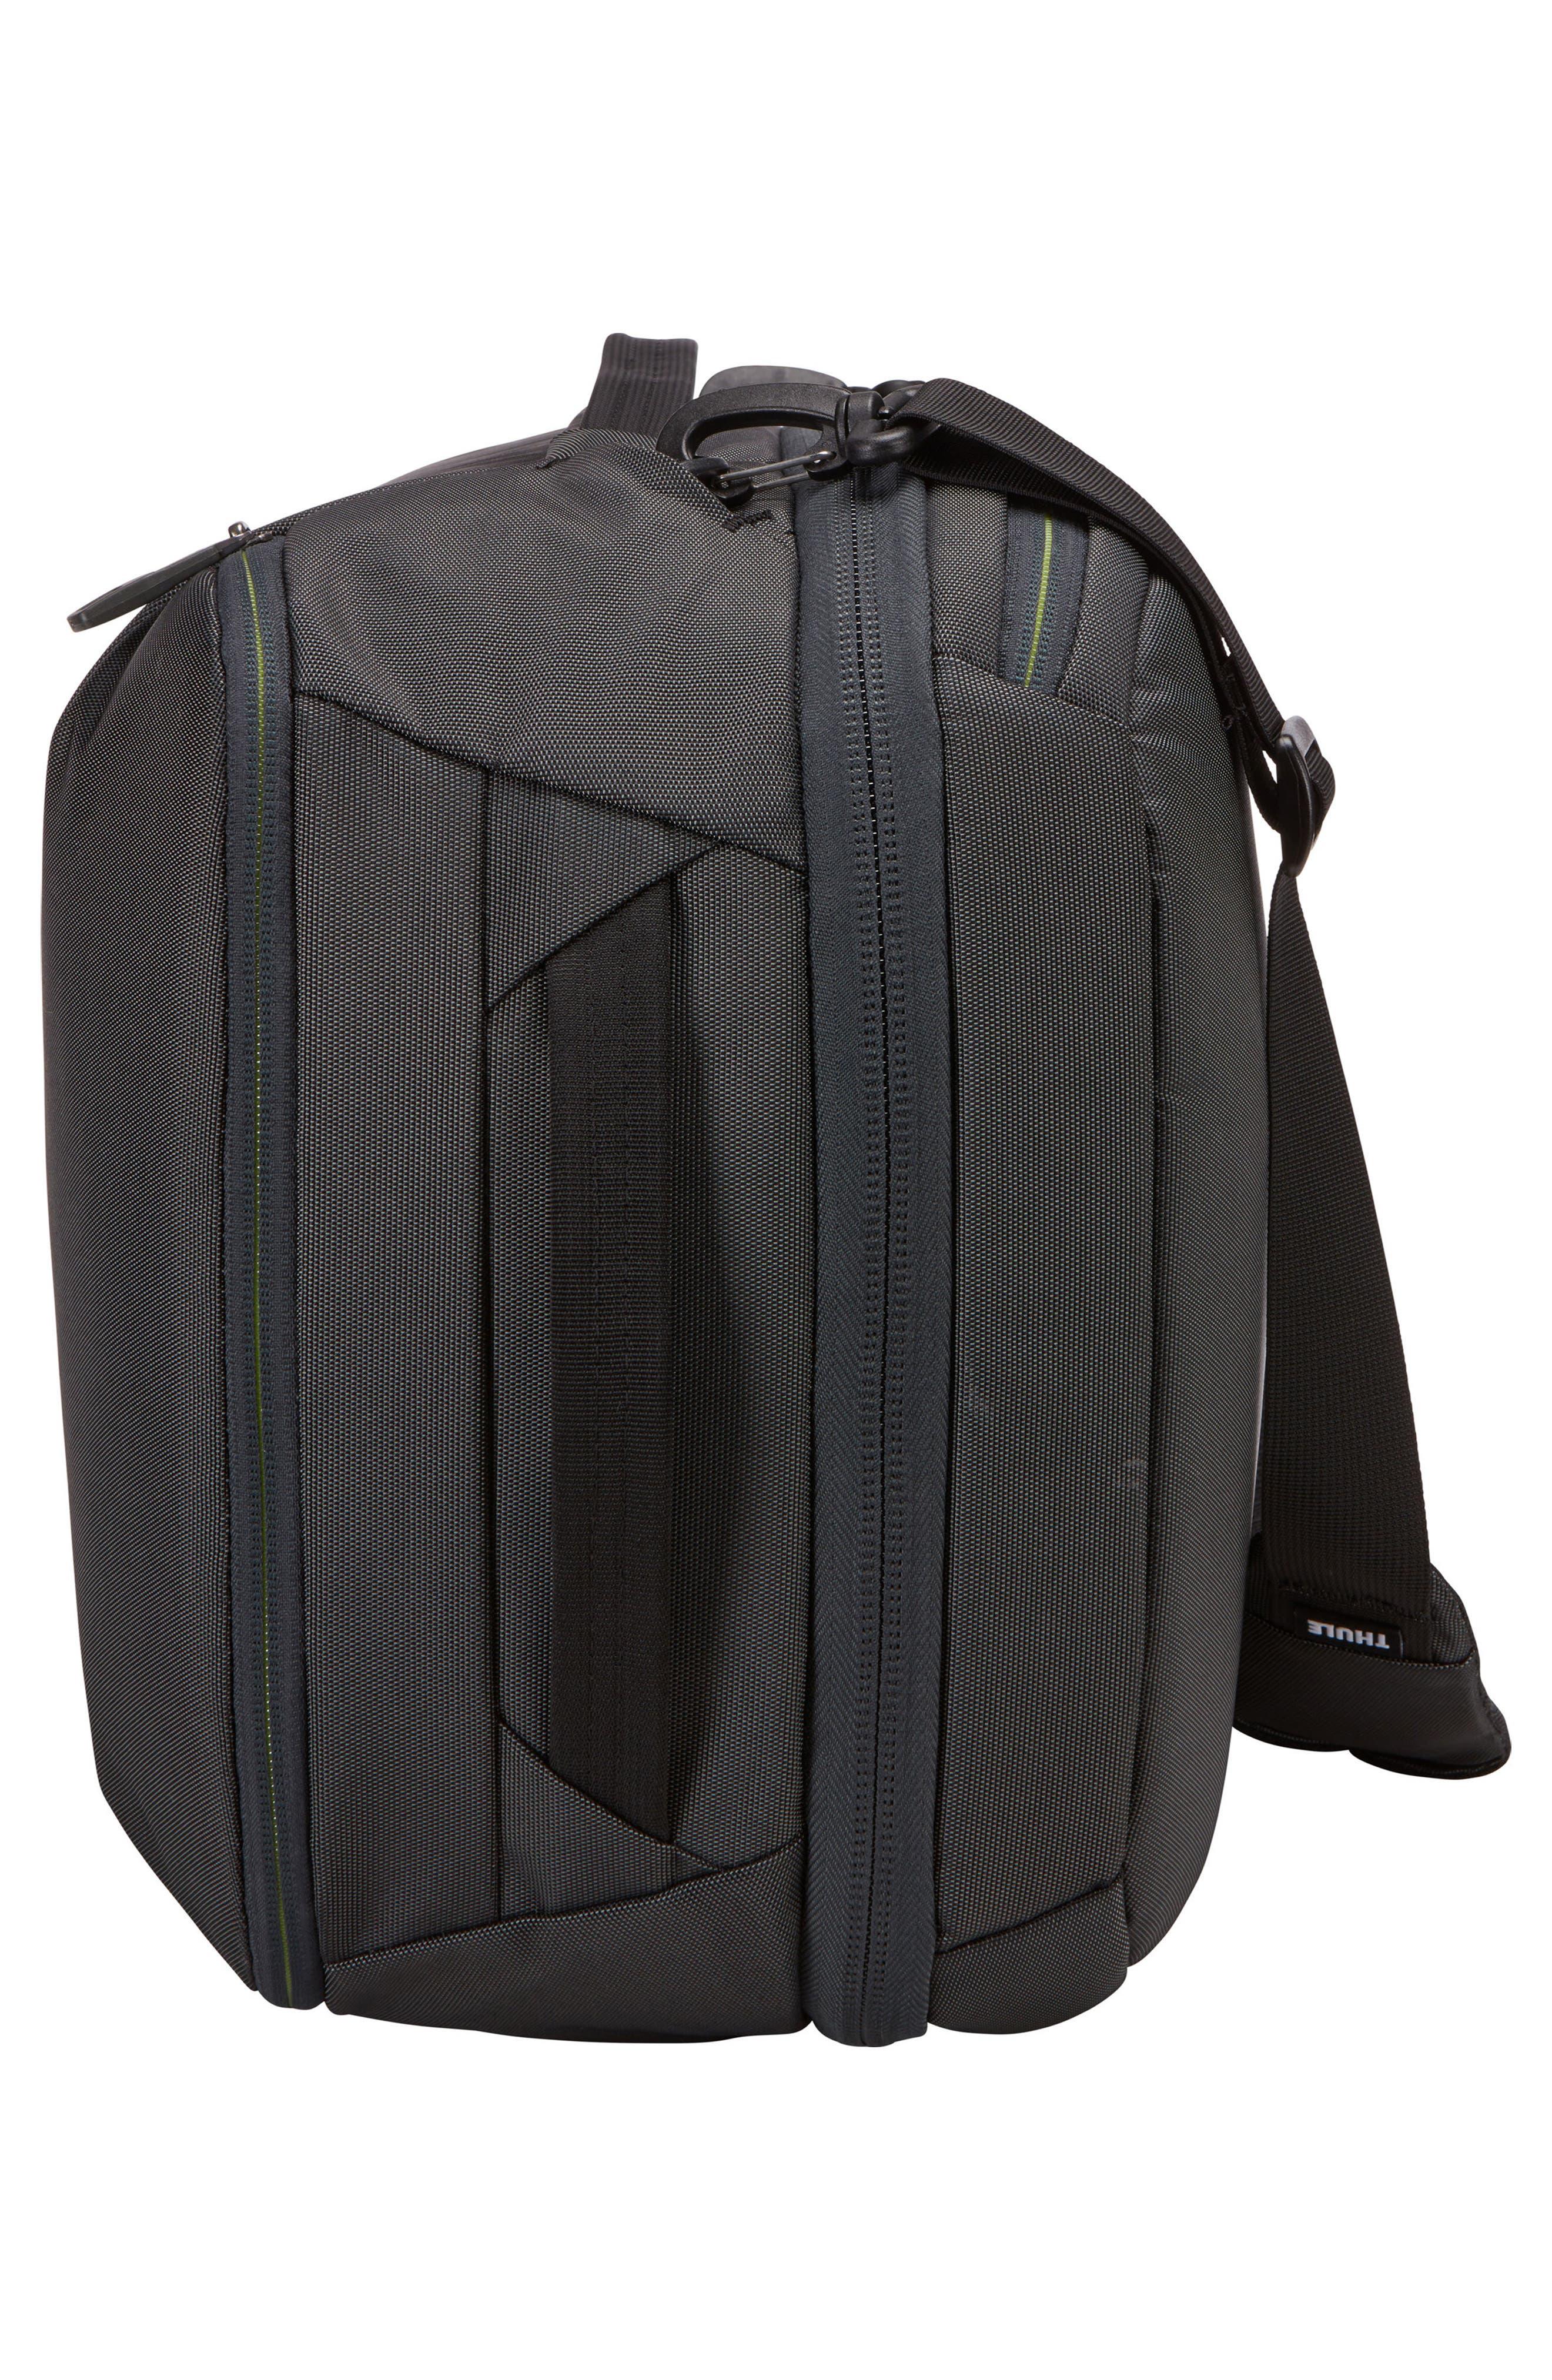 Subterra 40-Liter Convertible Duffel Bag,                             Alternate thumbnail 8, color,                             Dark Shadow